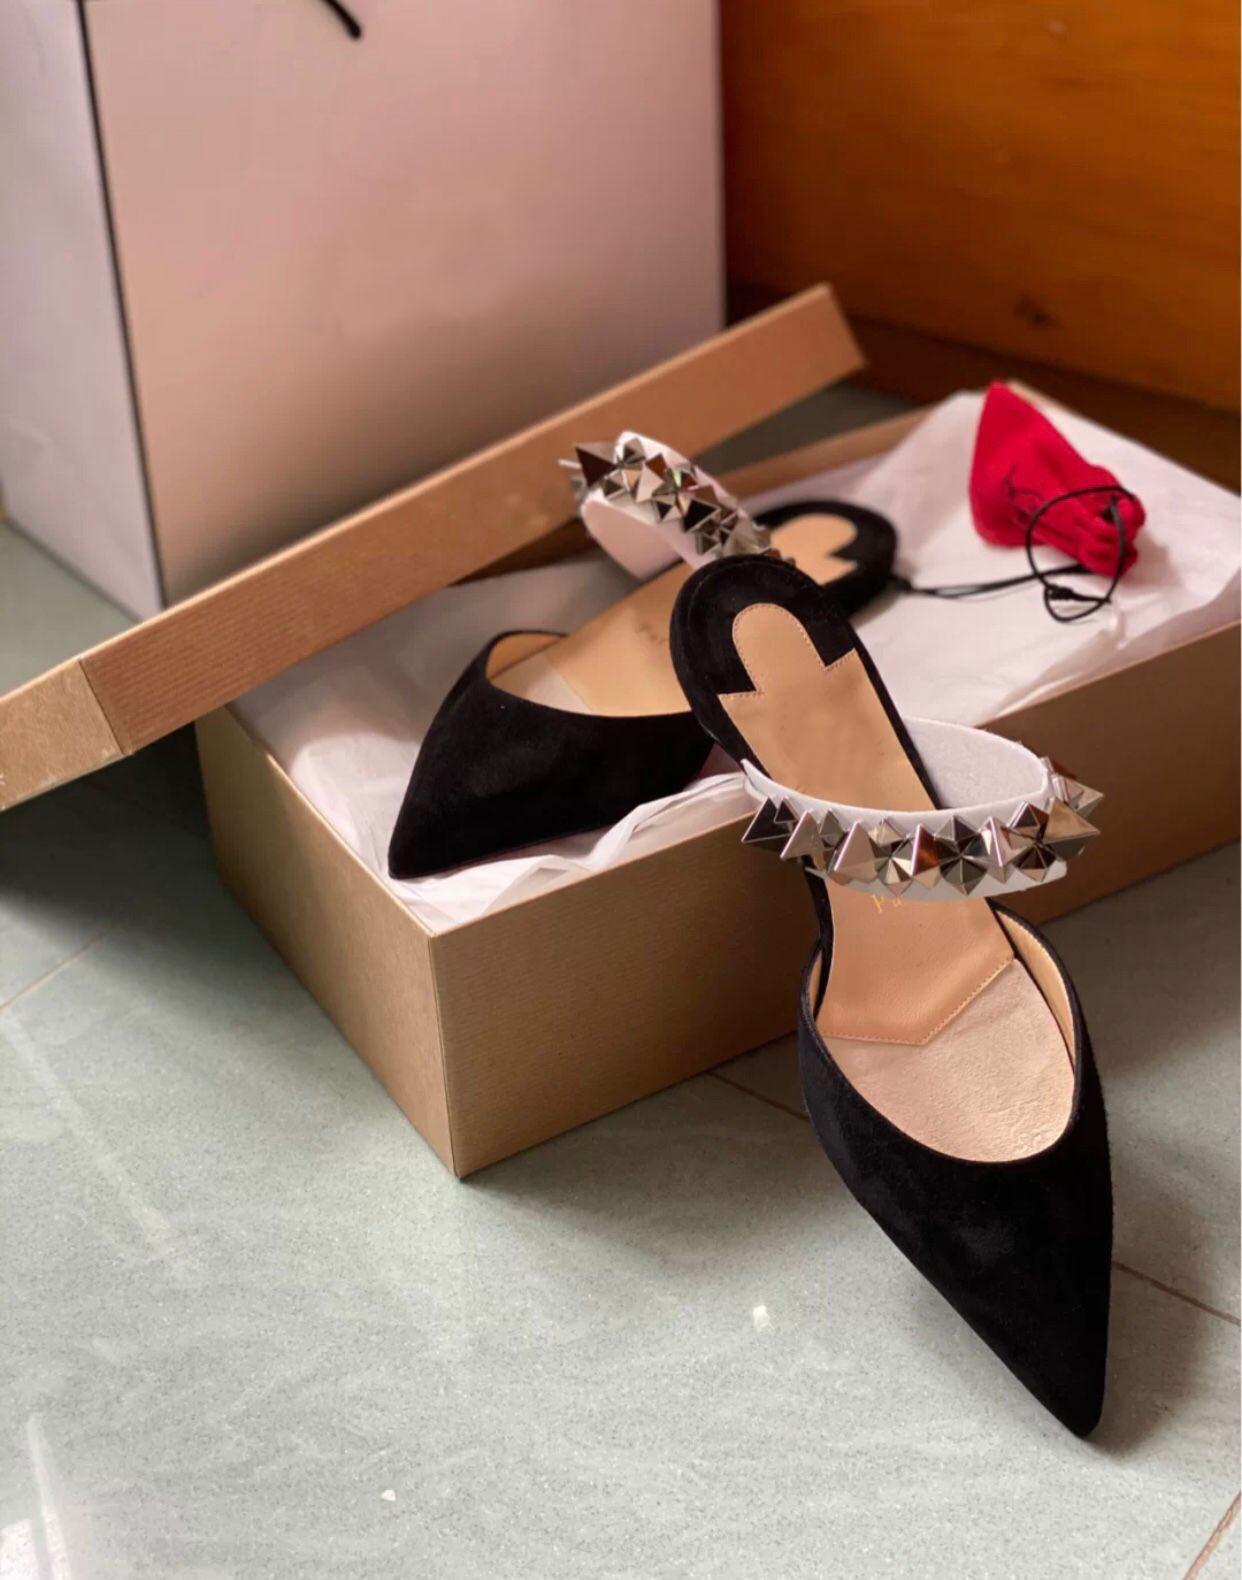 Summer Pointed Toe Women Red Bottom Planet Choc Flat Lady Sandals Slippers Studs Sandals Flats Luxury Designer Flip Flops Sandalias